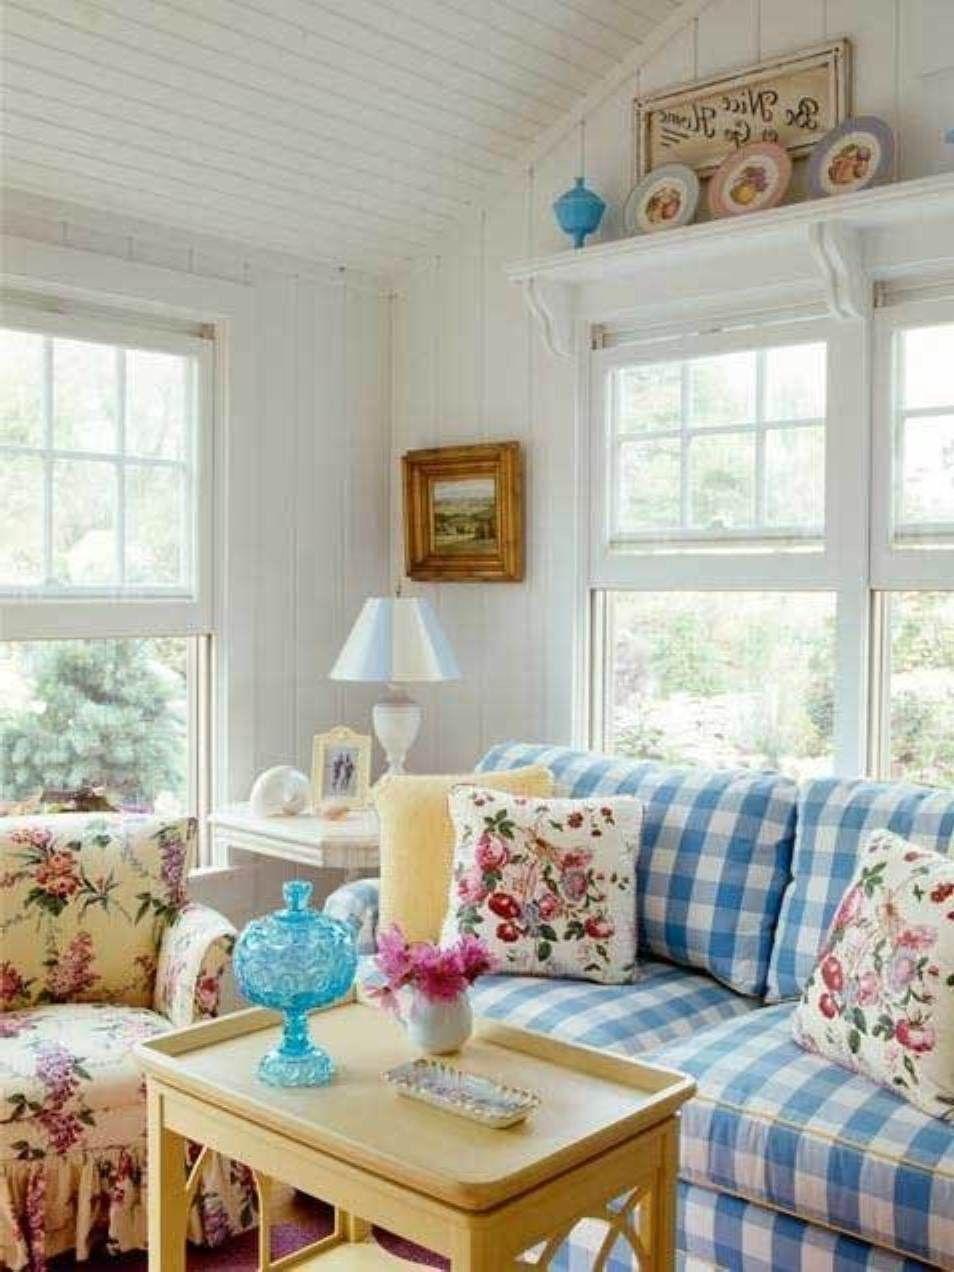 6 Amazing Small Living Room Ideas Small Living Room Ideas